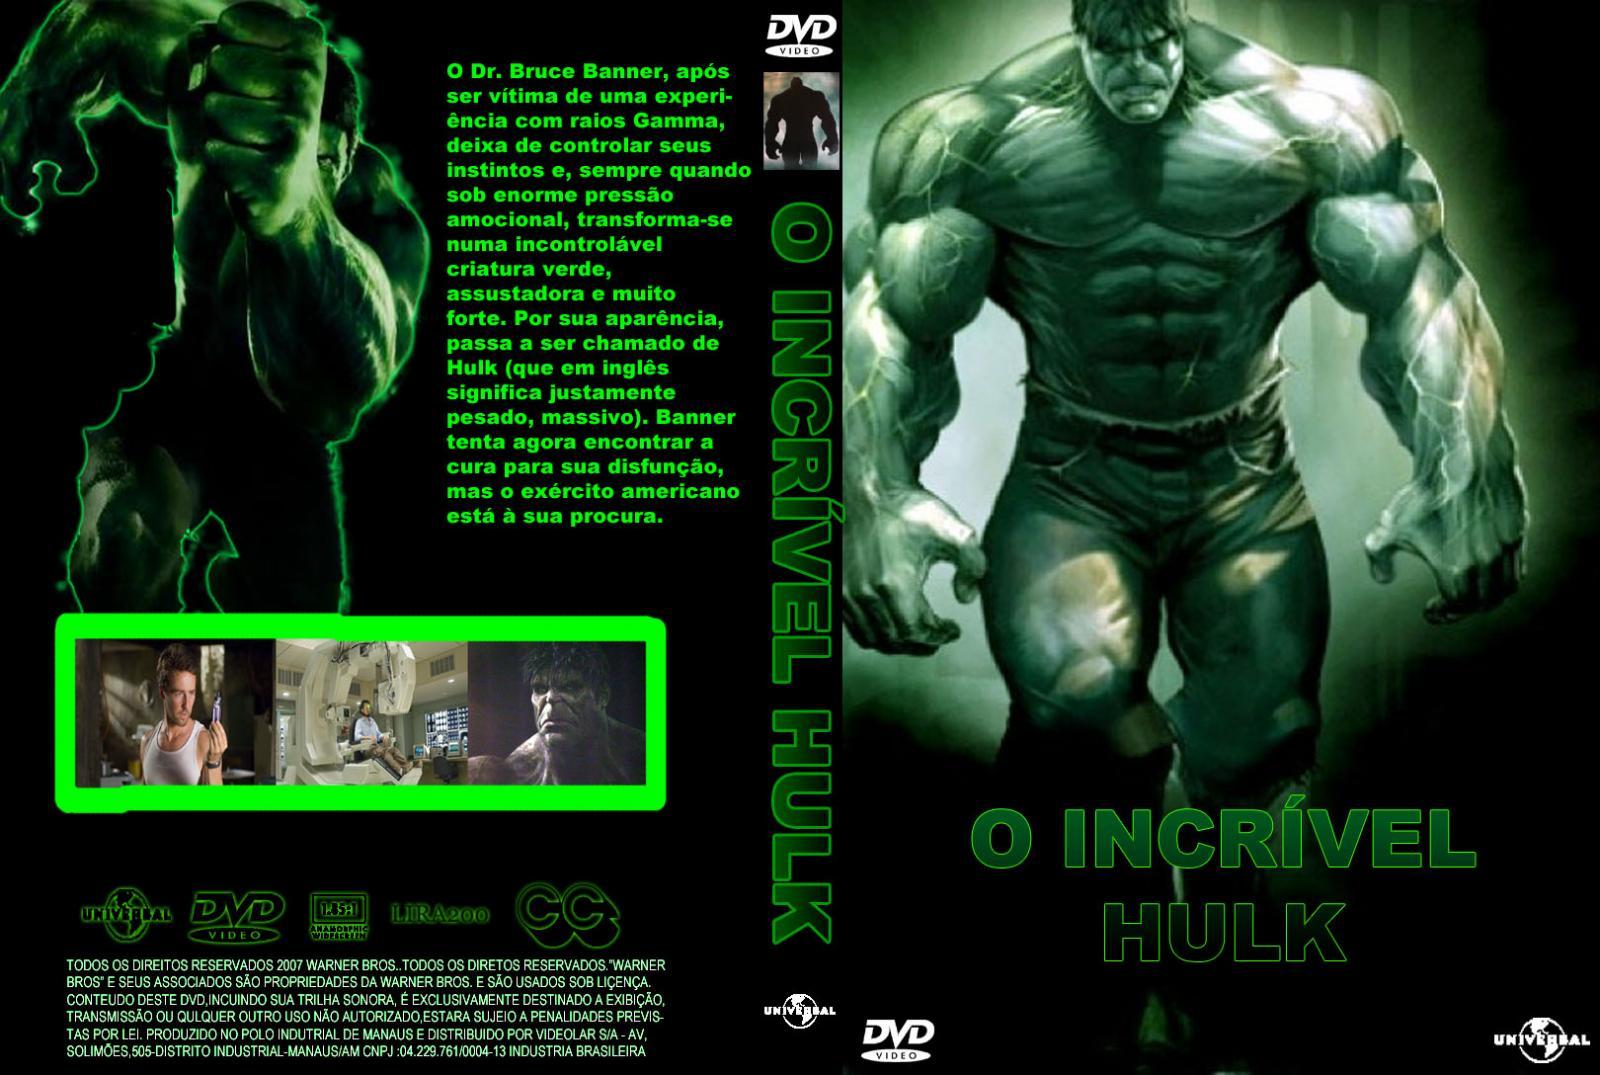 http://2.bp.blogspot.com/_eoutIDi4zcY/S8dVKT3XpTI/AAAAAAAAAeE/h6ilODfAmb8/s1600/O+Incrivel+Hulk+1+Capa+2.jpg